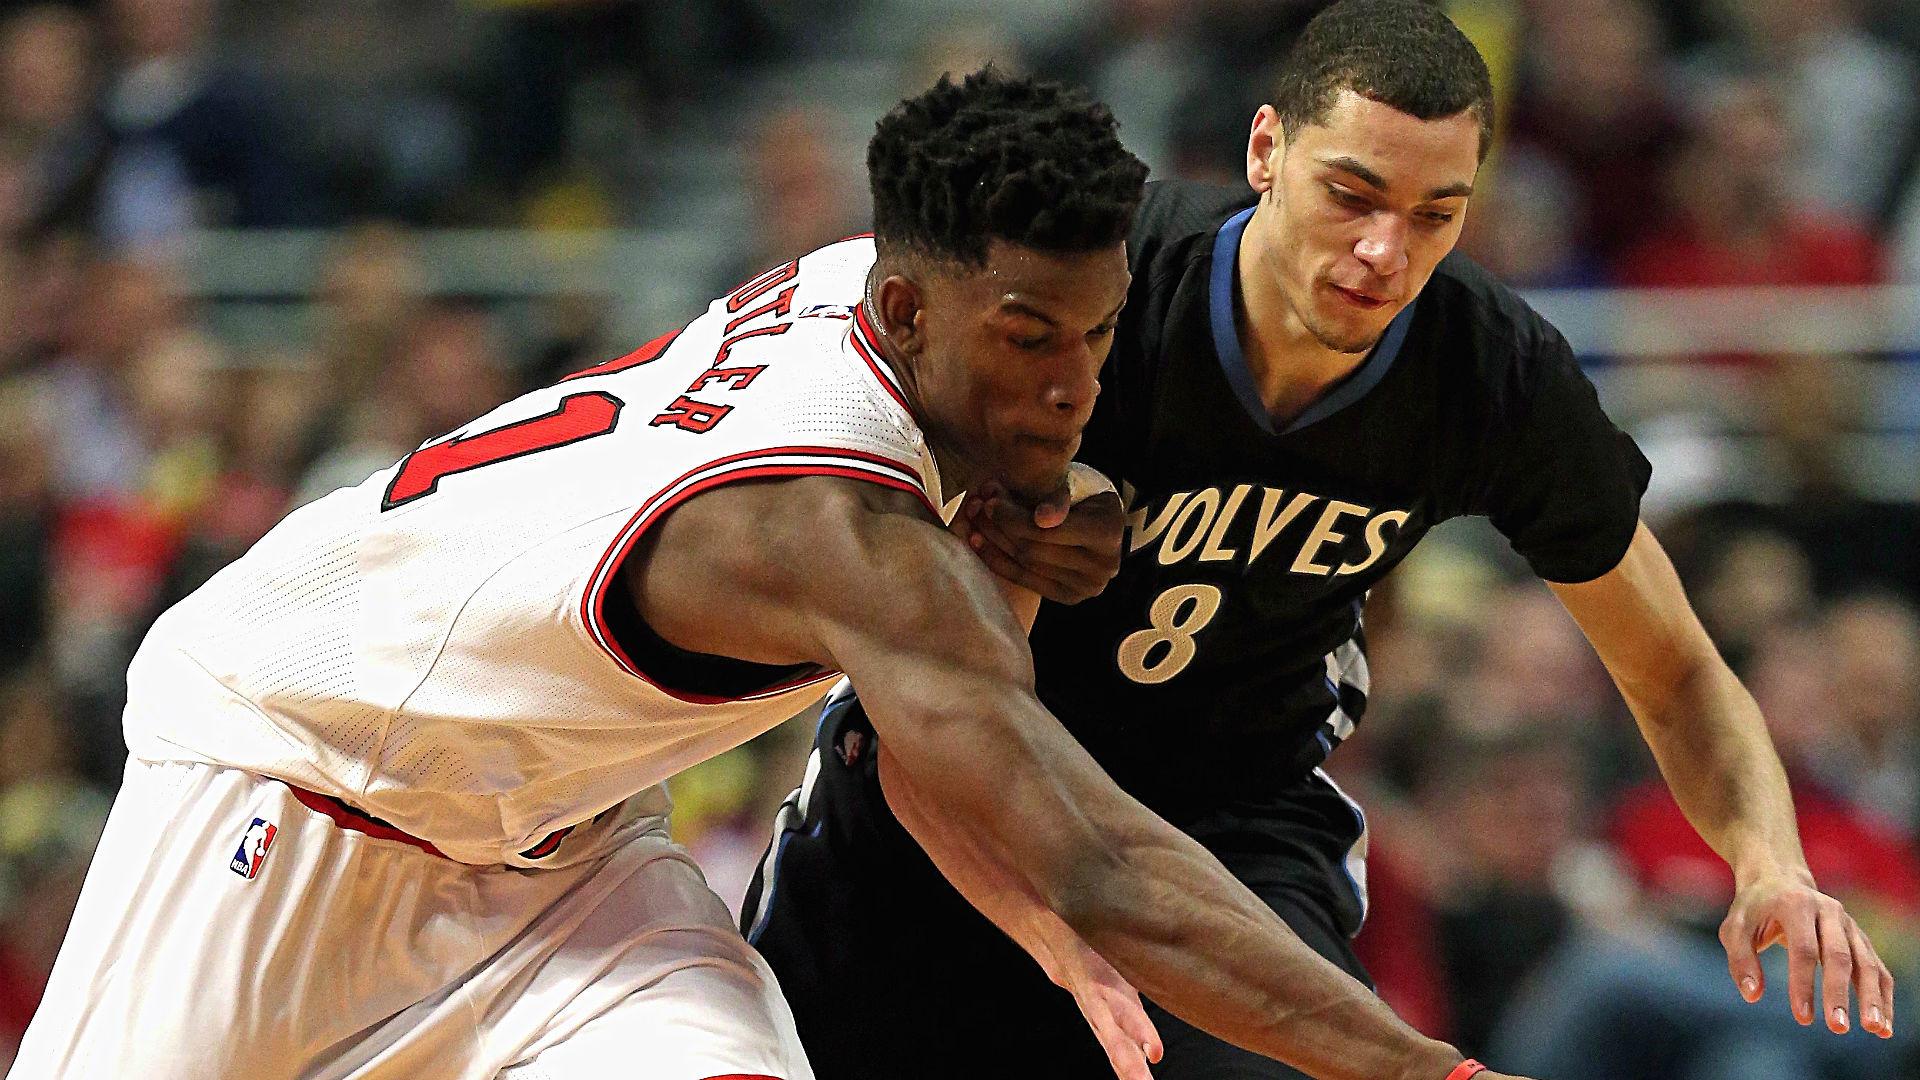 2017 NBA Draft: Timberwolves acquire Jimmy Butler from Bulls